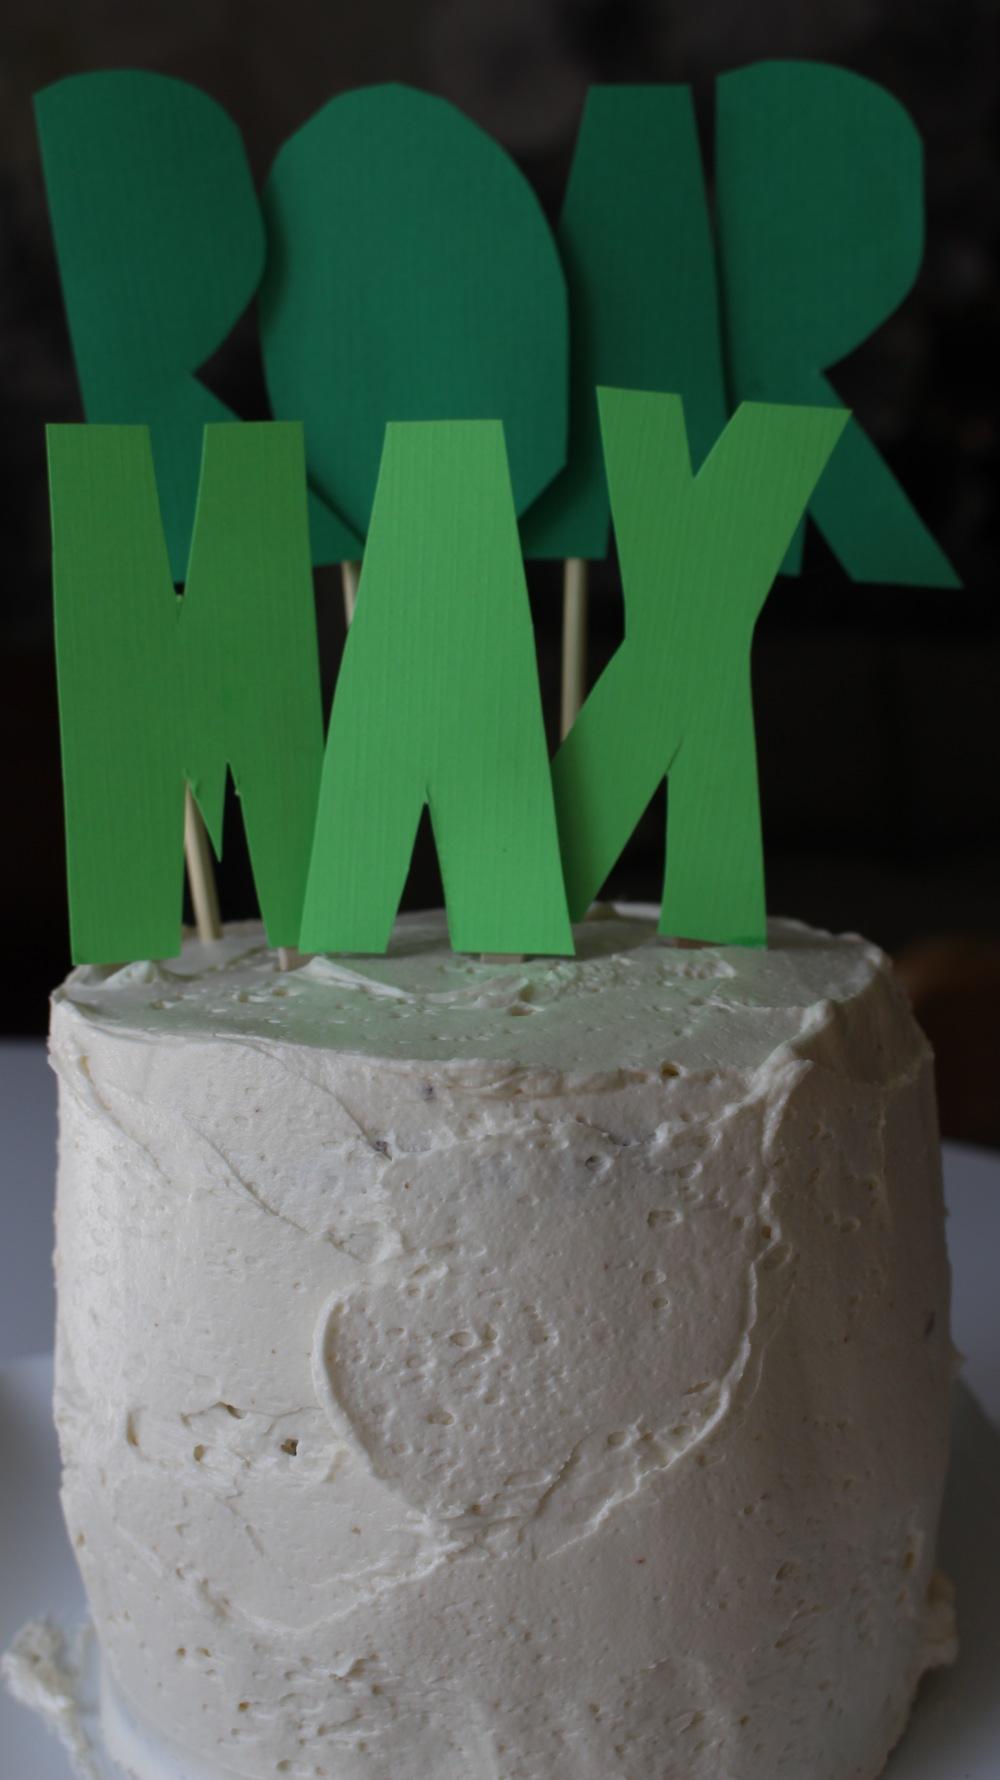 Smash cake! #Moderdino #dinosaurs #firstbirthday #dinobirthdayparty #kidsbirthday #meandthemoose